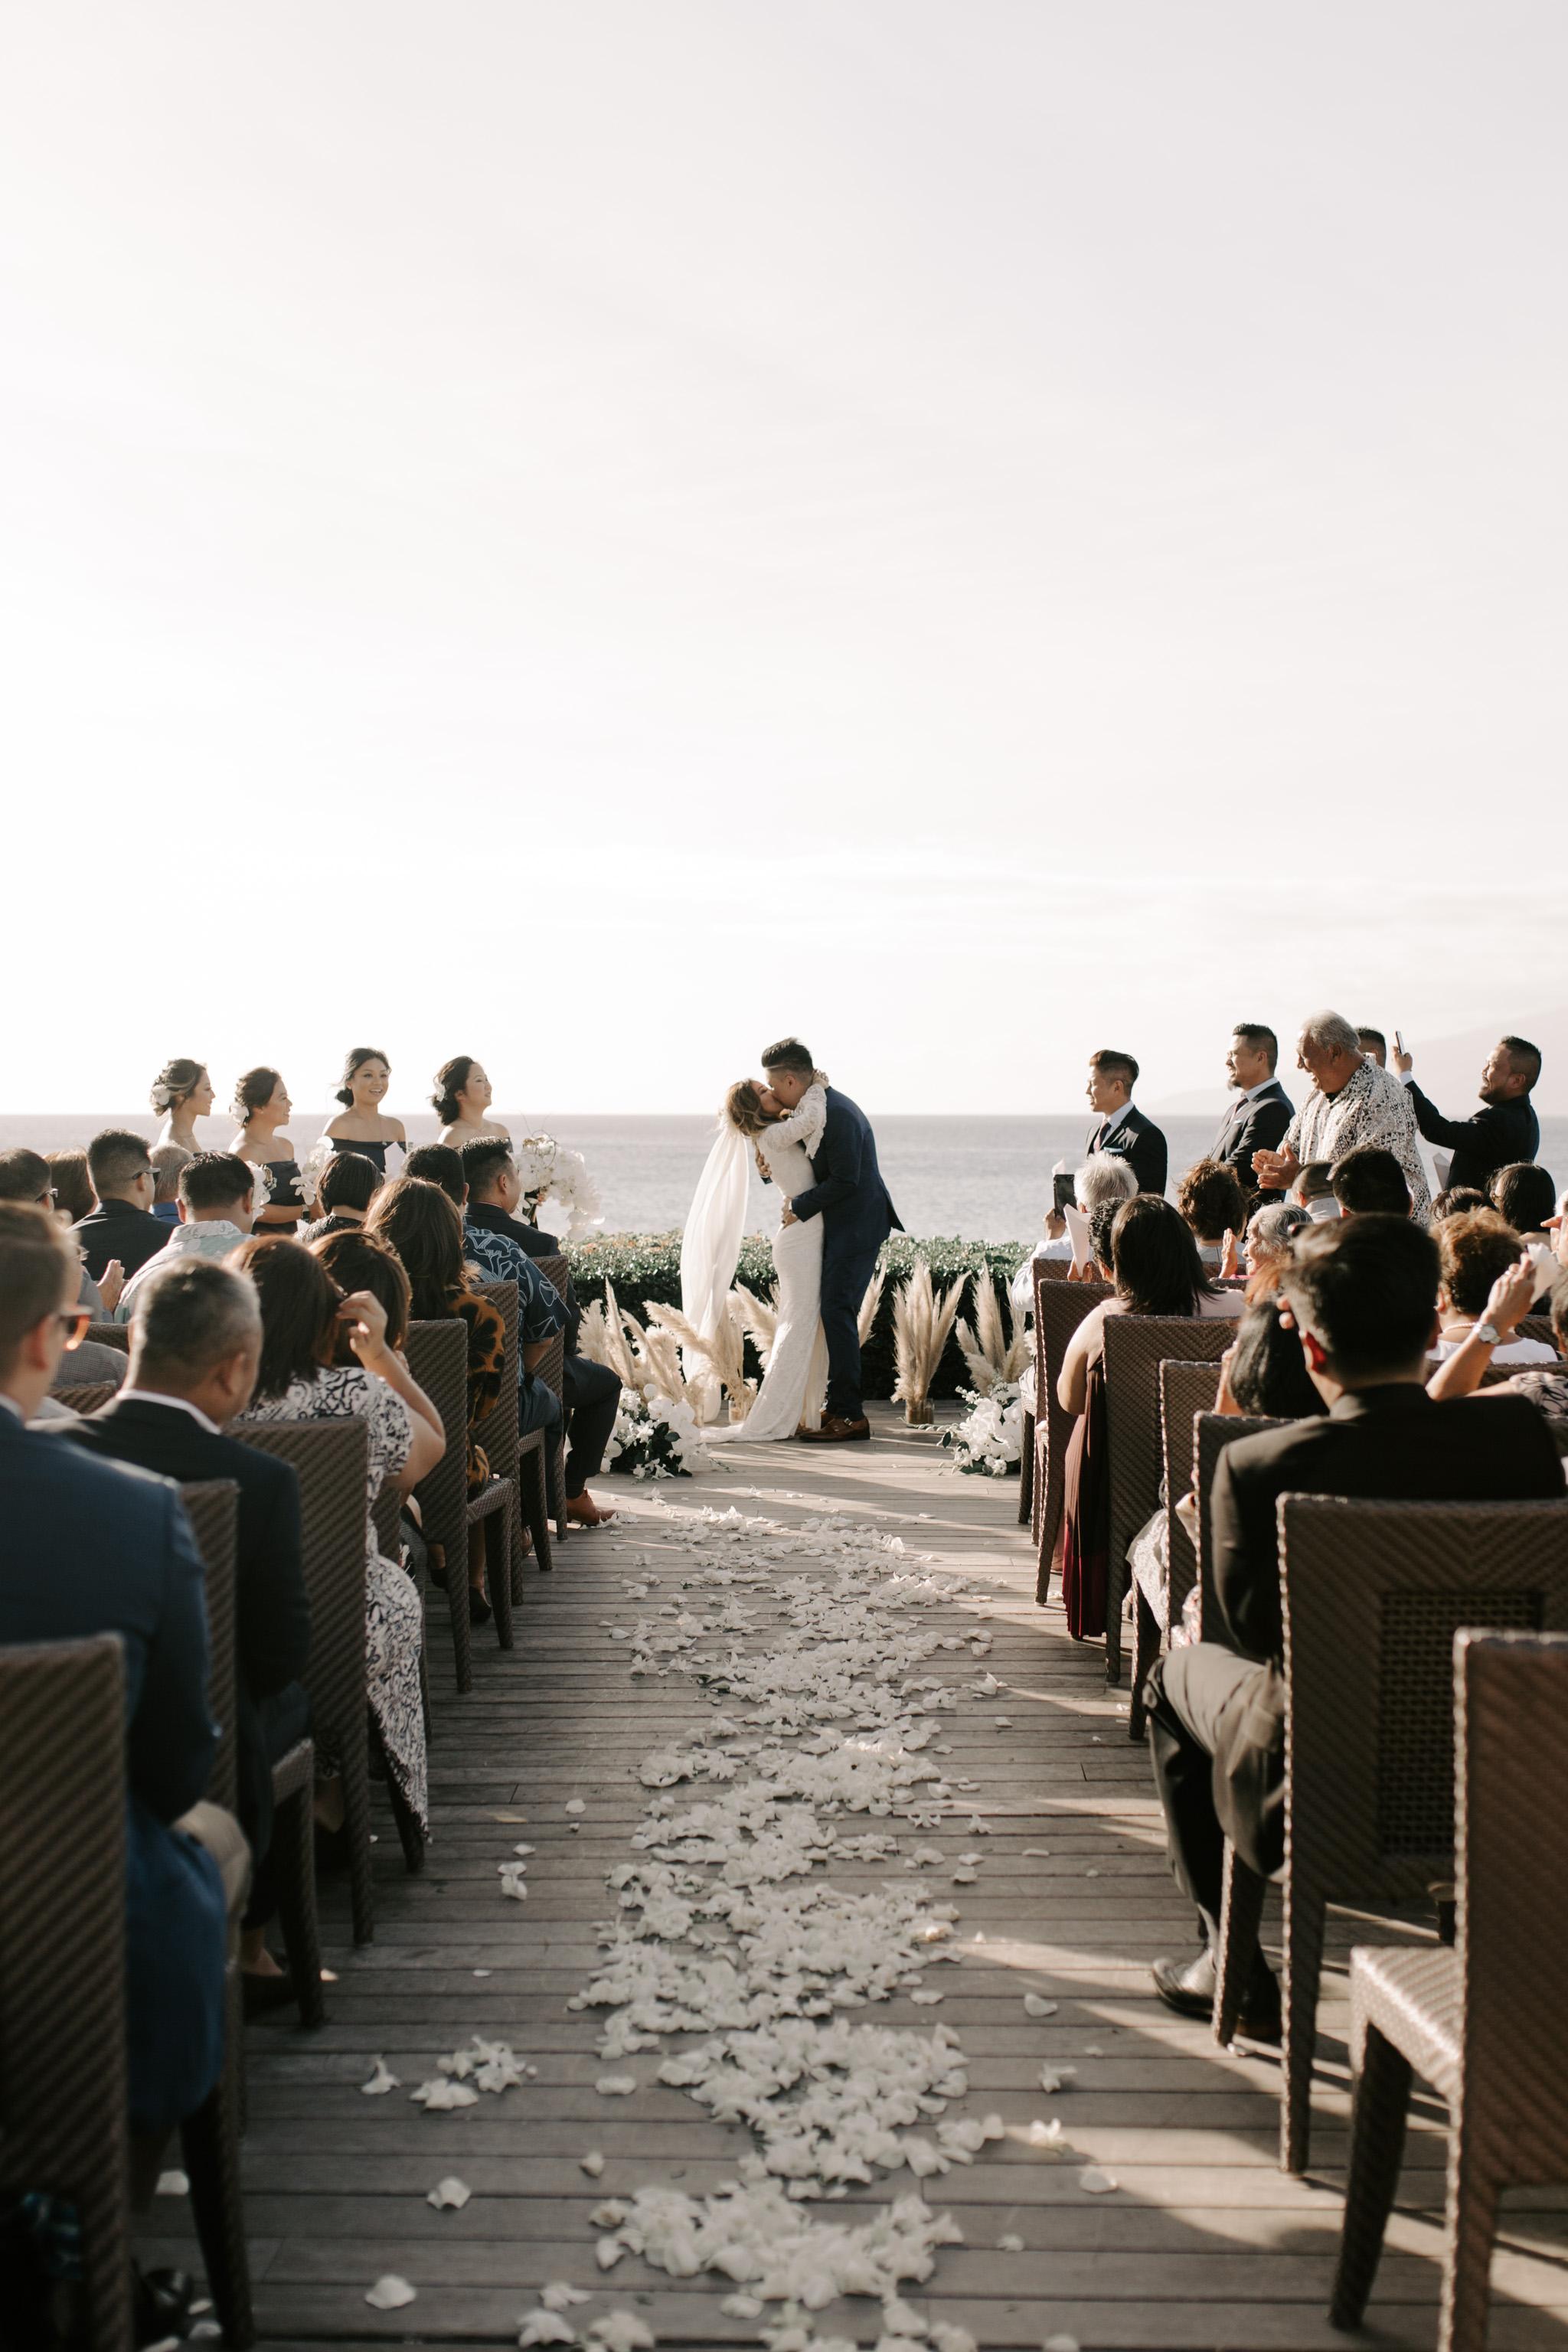 Merrimans Kapalua Maui Wedding By Maui Wedding Photographer Desiree Leilani